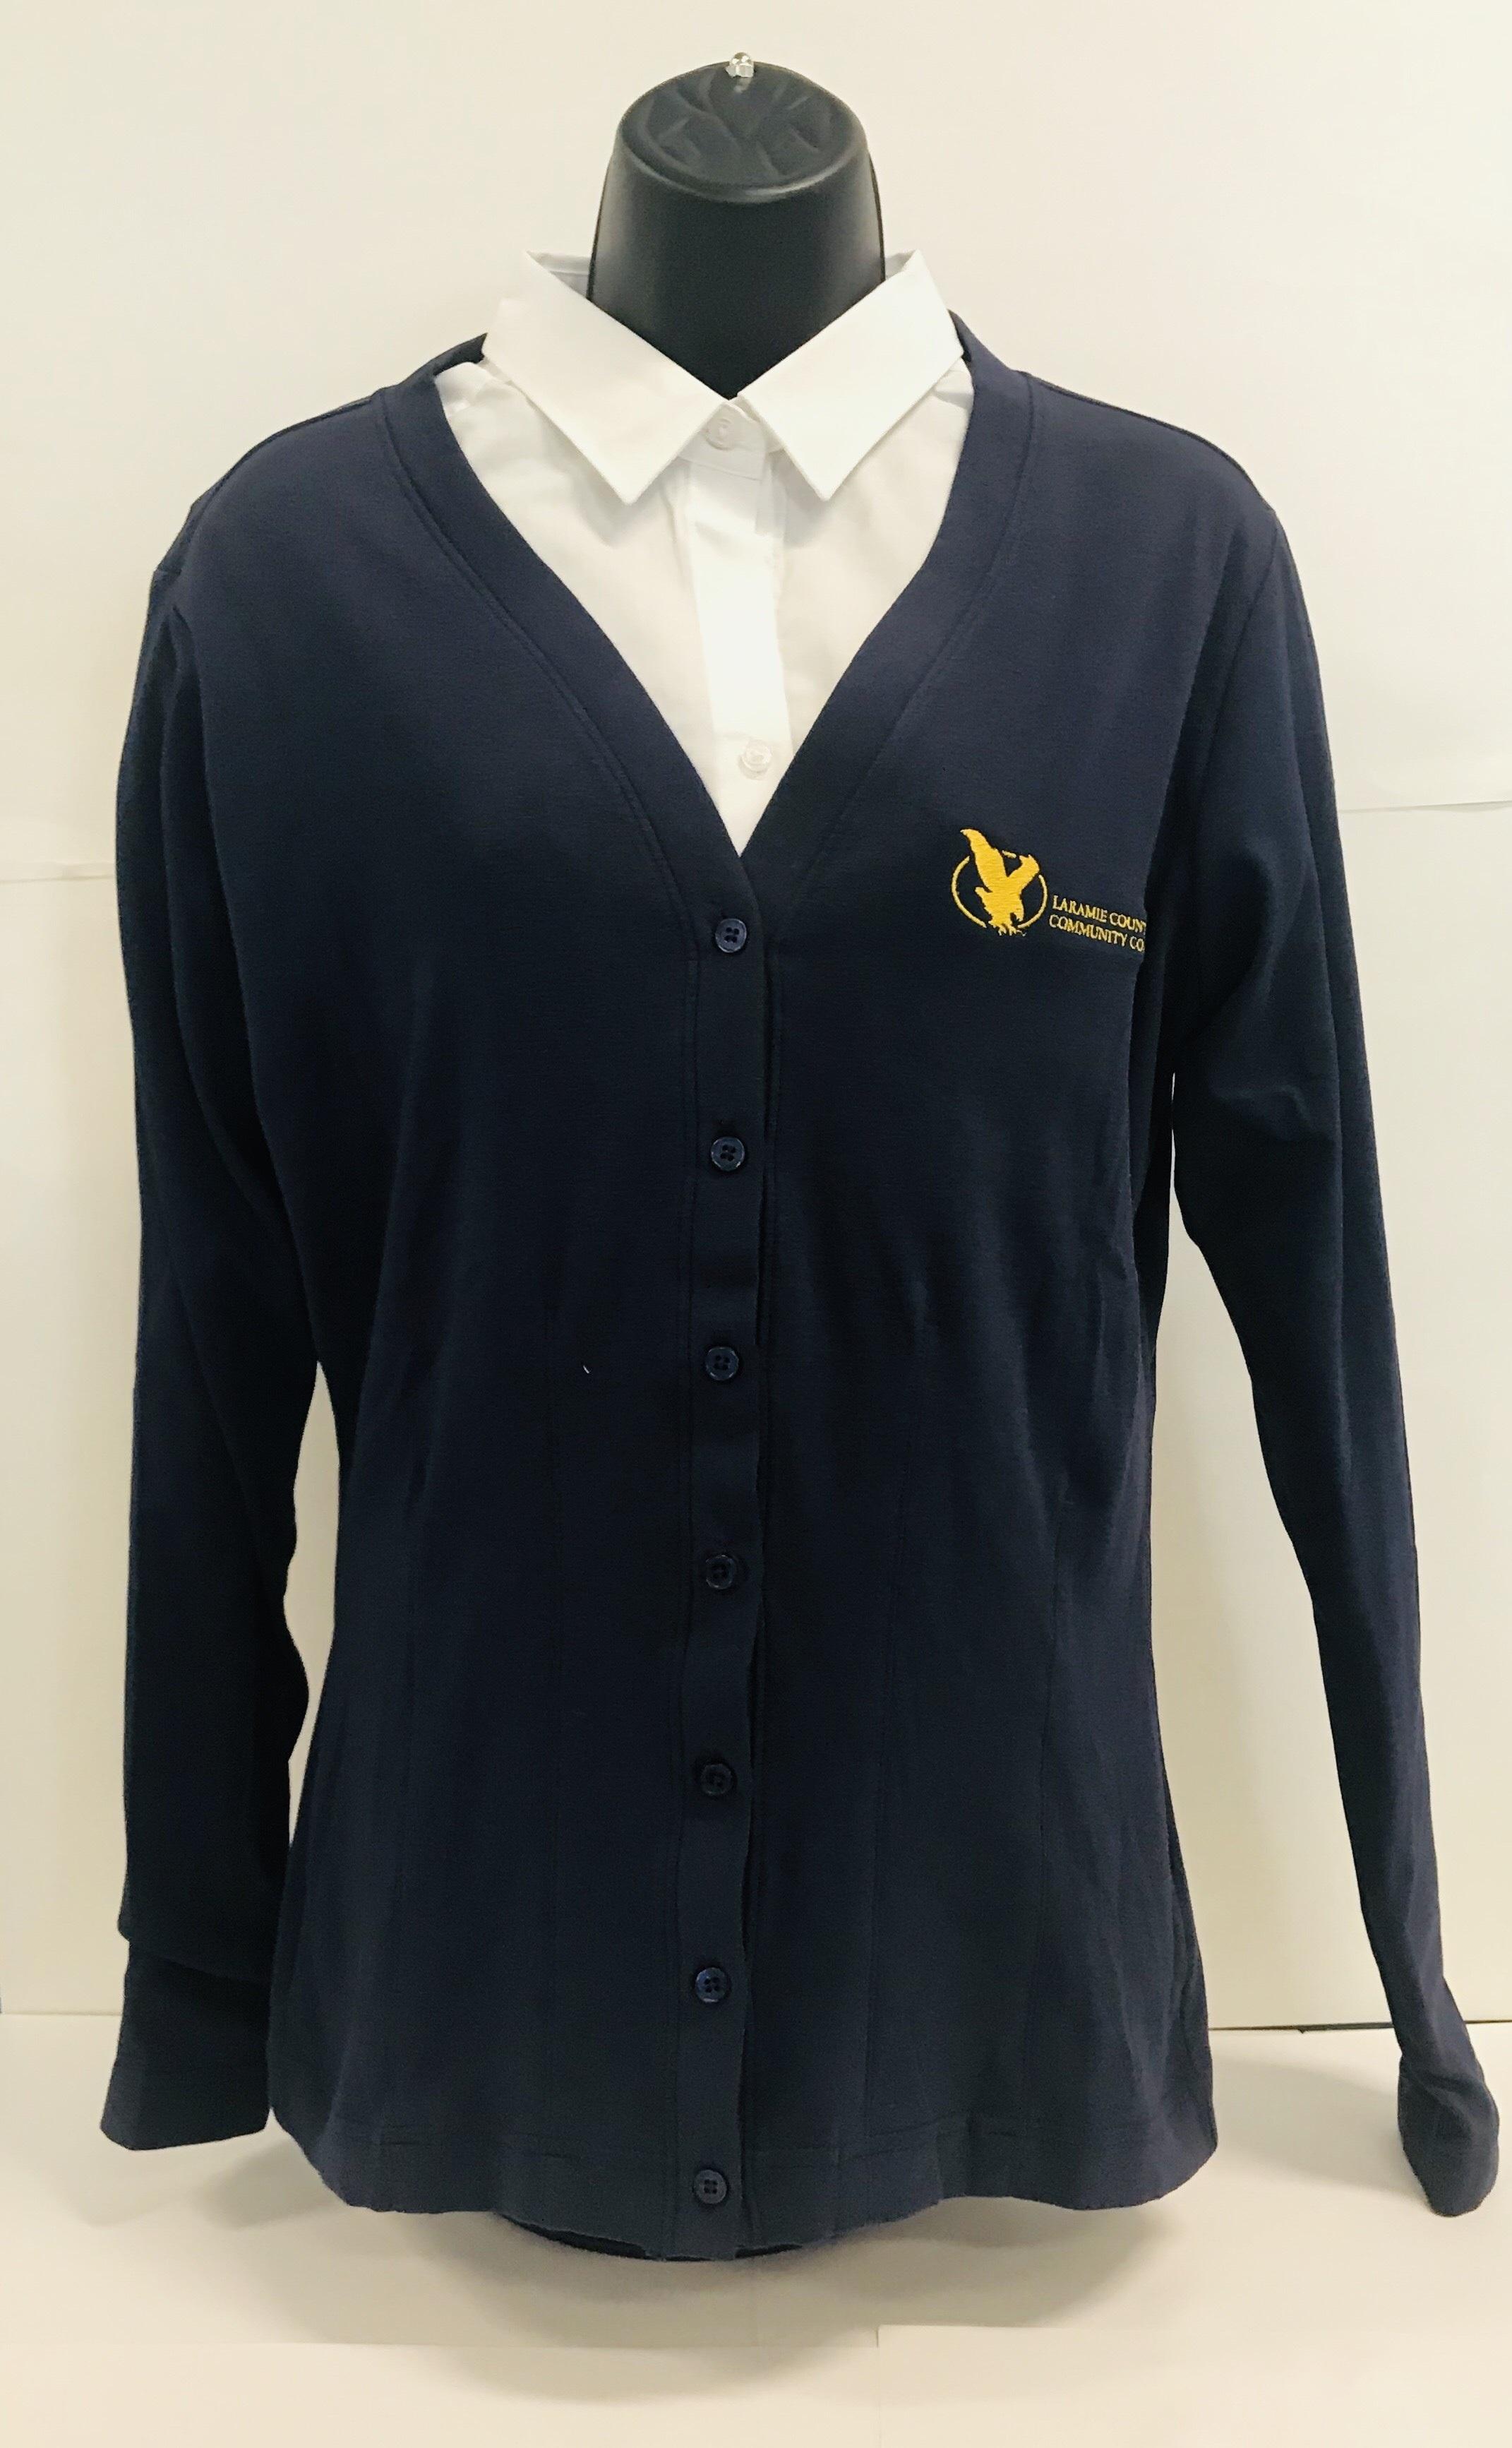 Women's Button up Cardigan Sweater